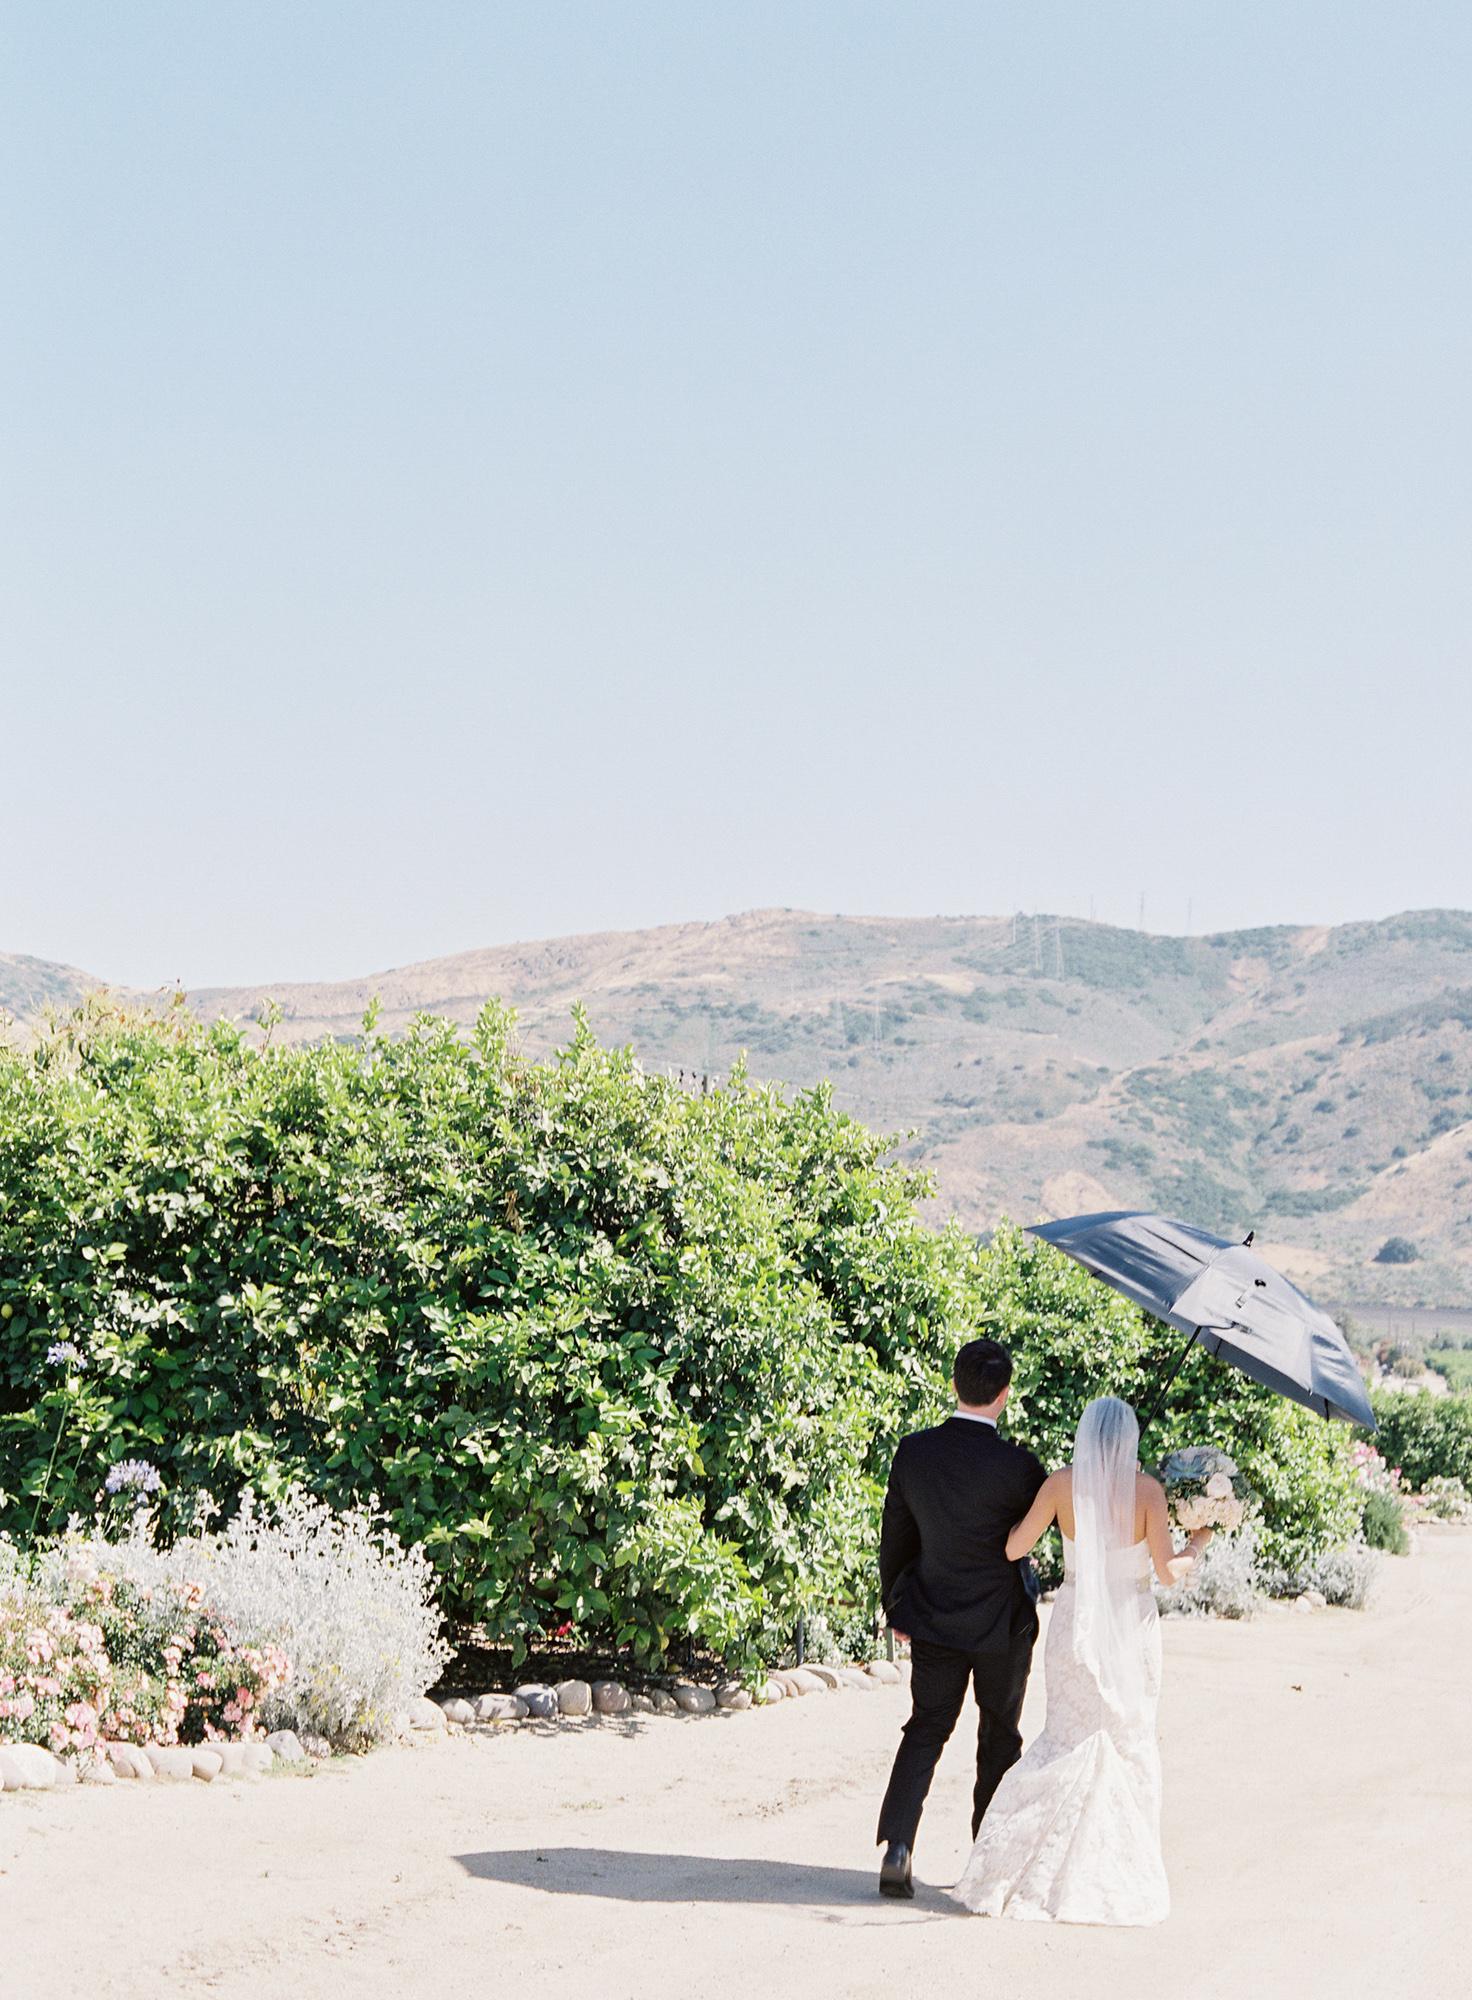 Gerry-Ranch-Wedding-Photography-Kristina-Adams-14.jpg